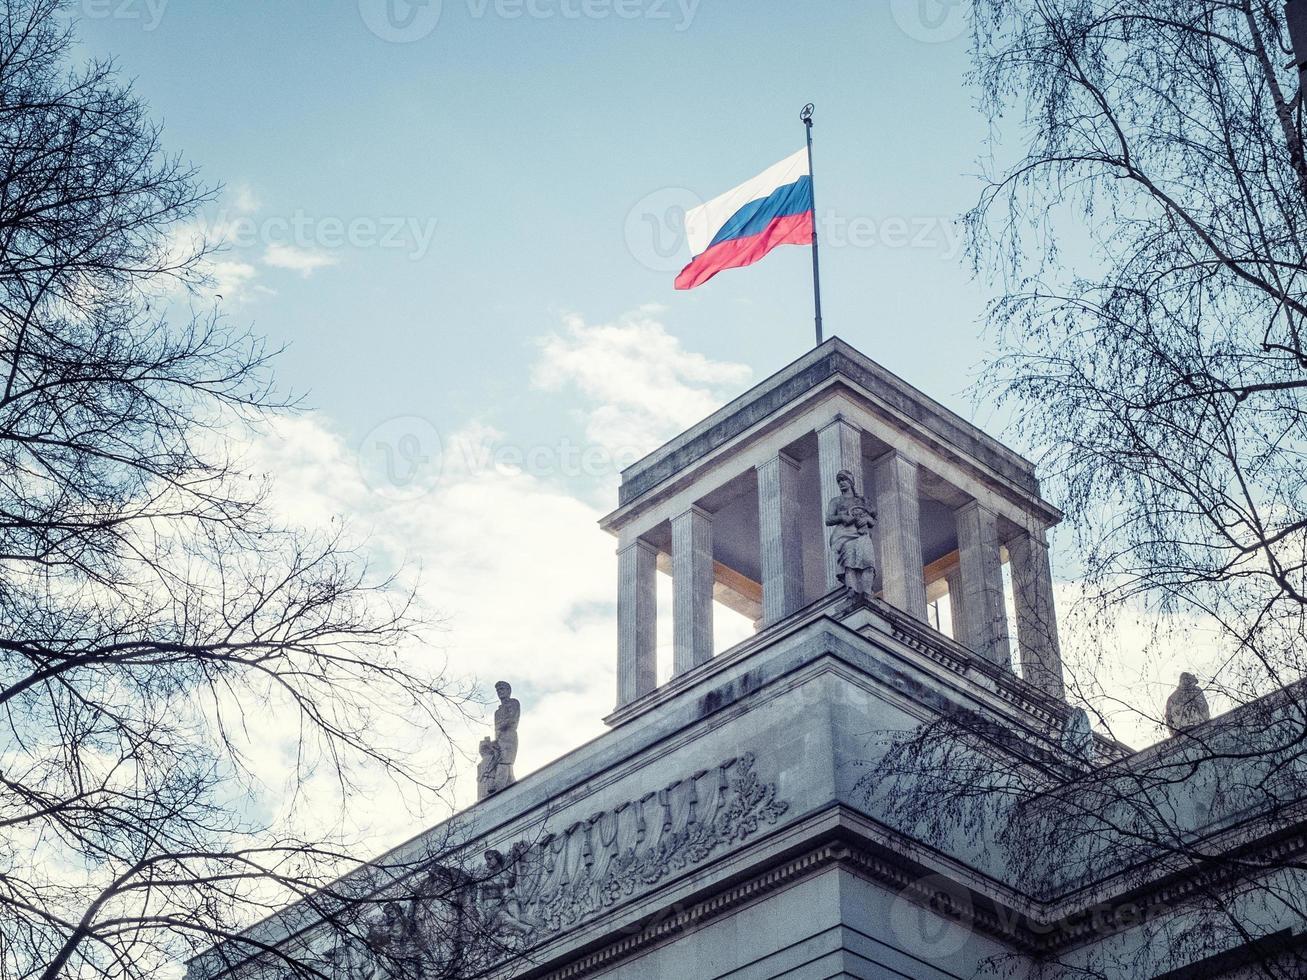 russische Botschaft foto